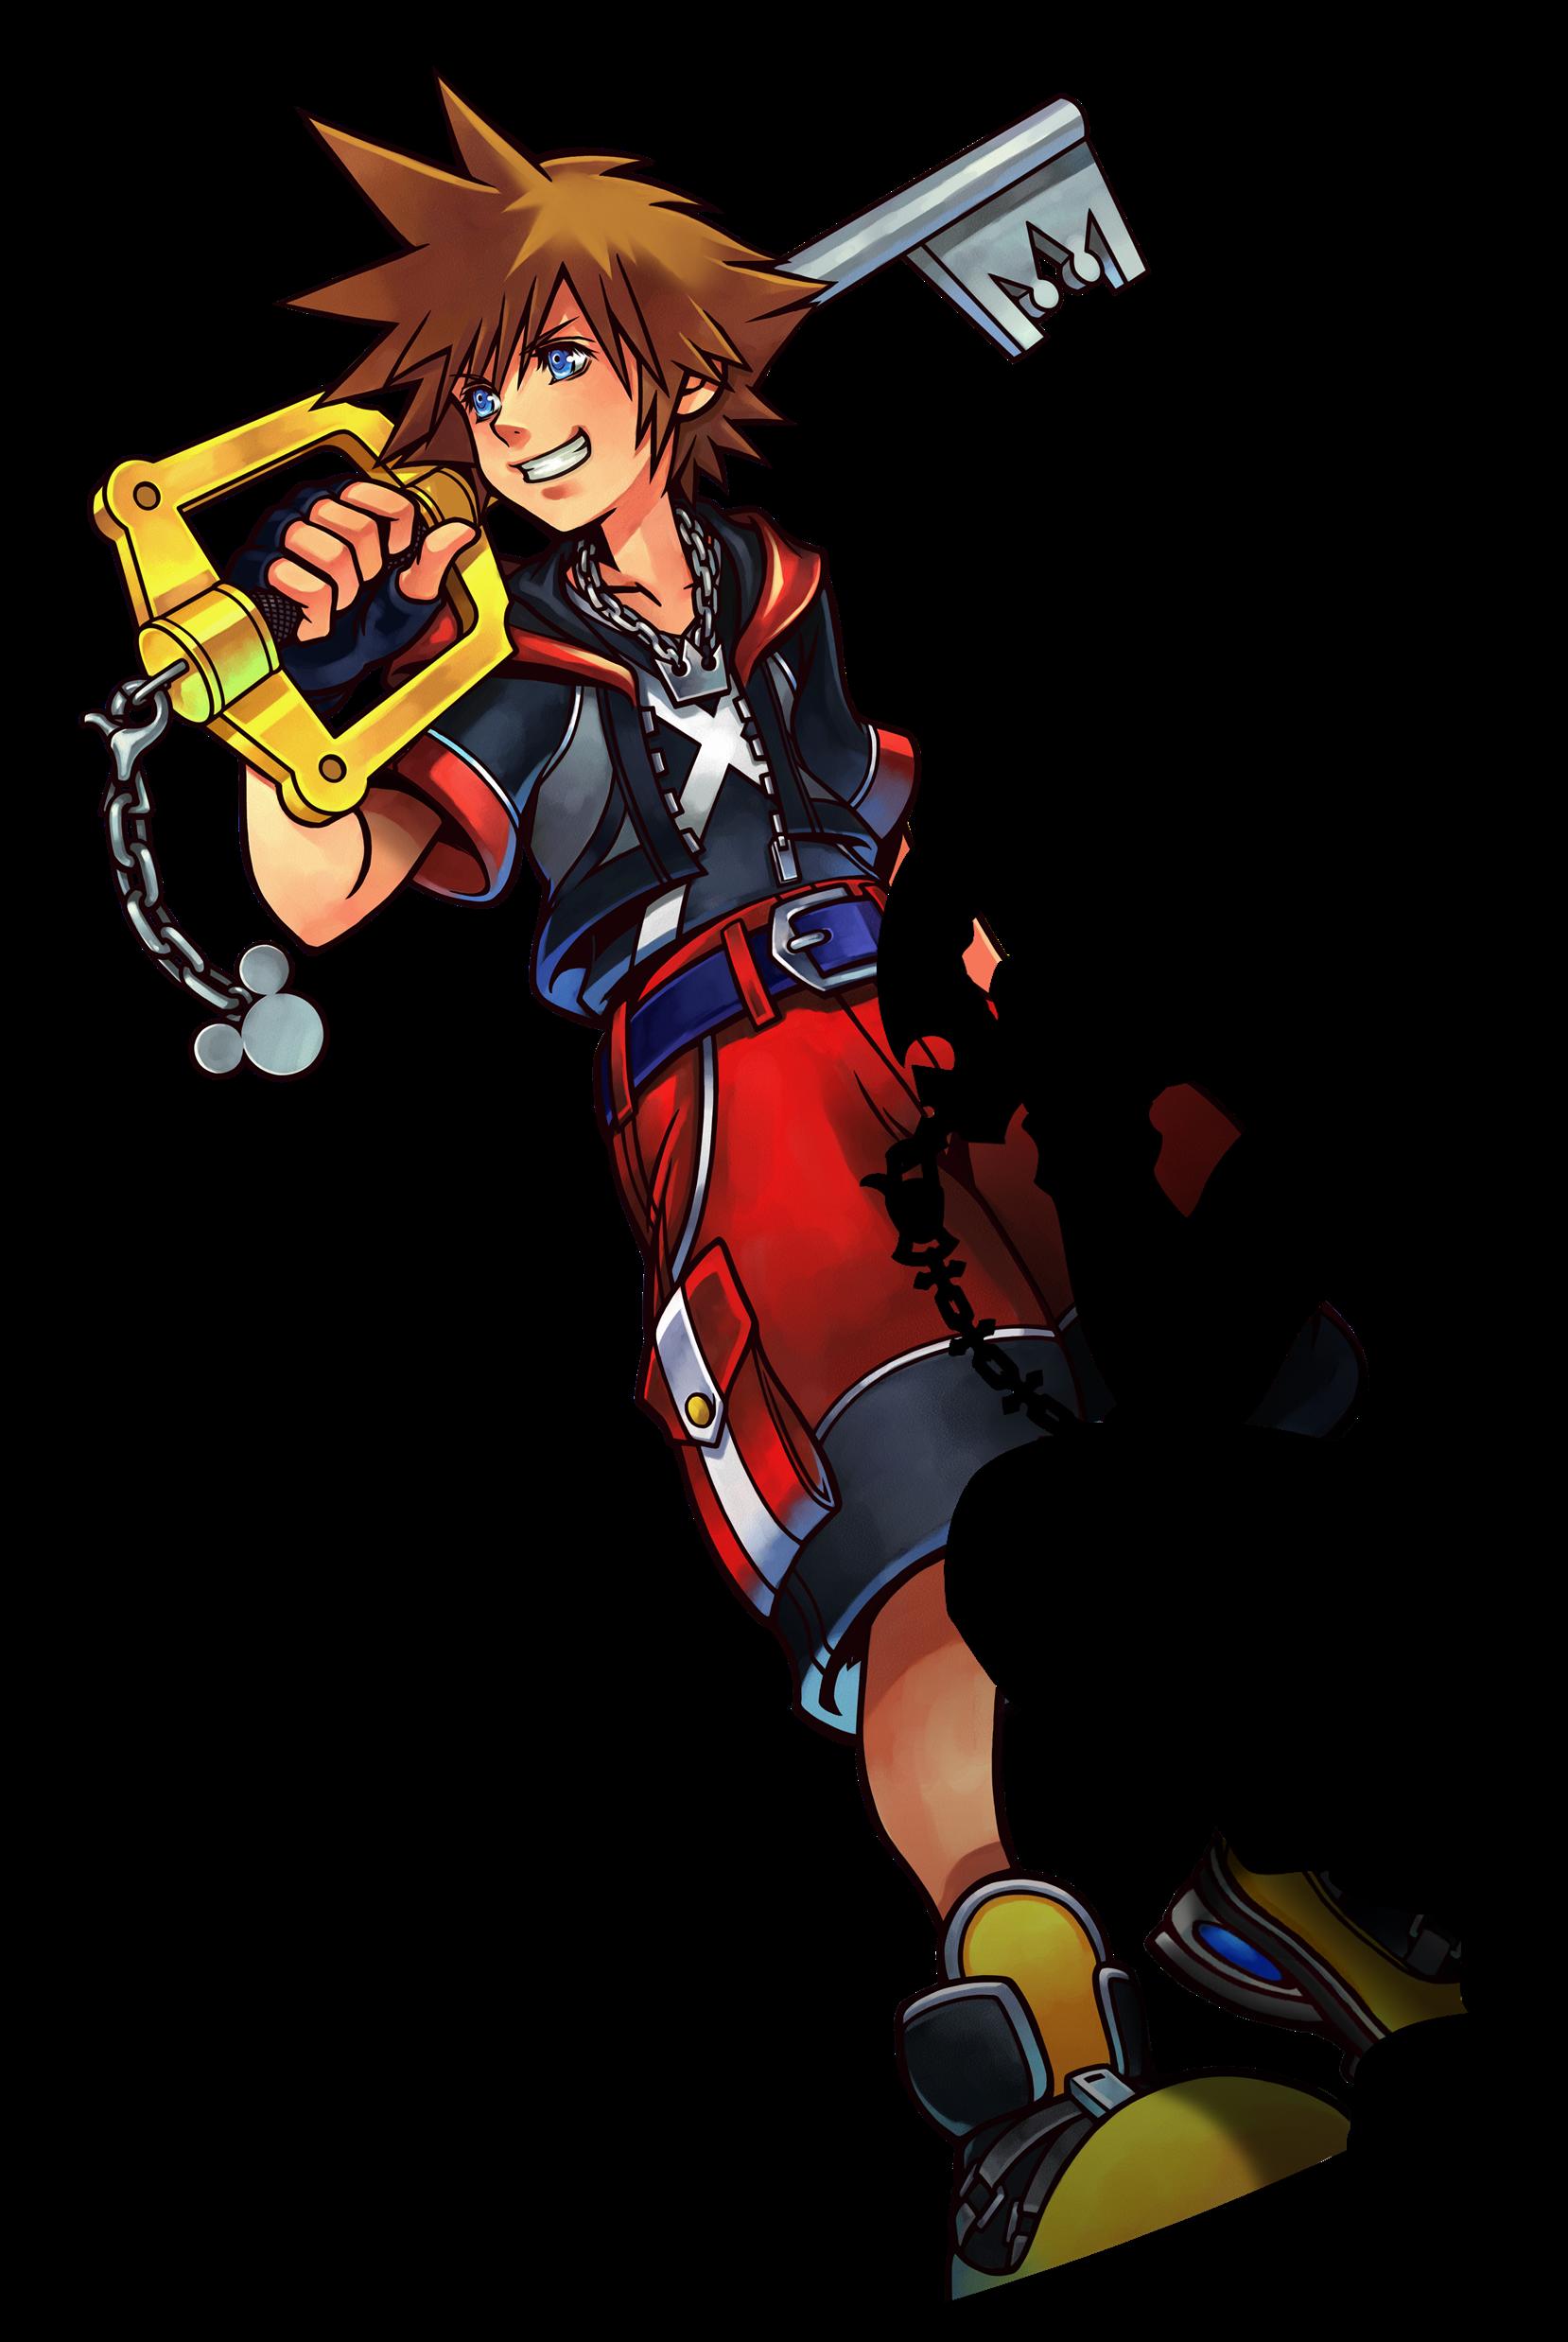 Game Kingdom Hearts Transparent PNG